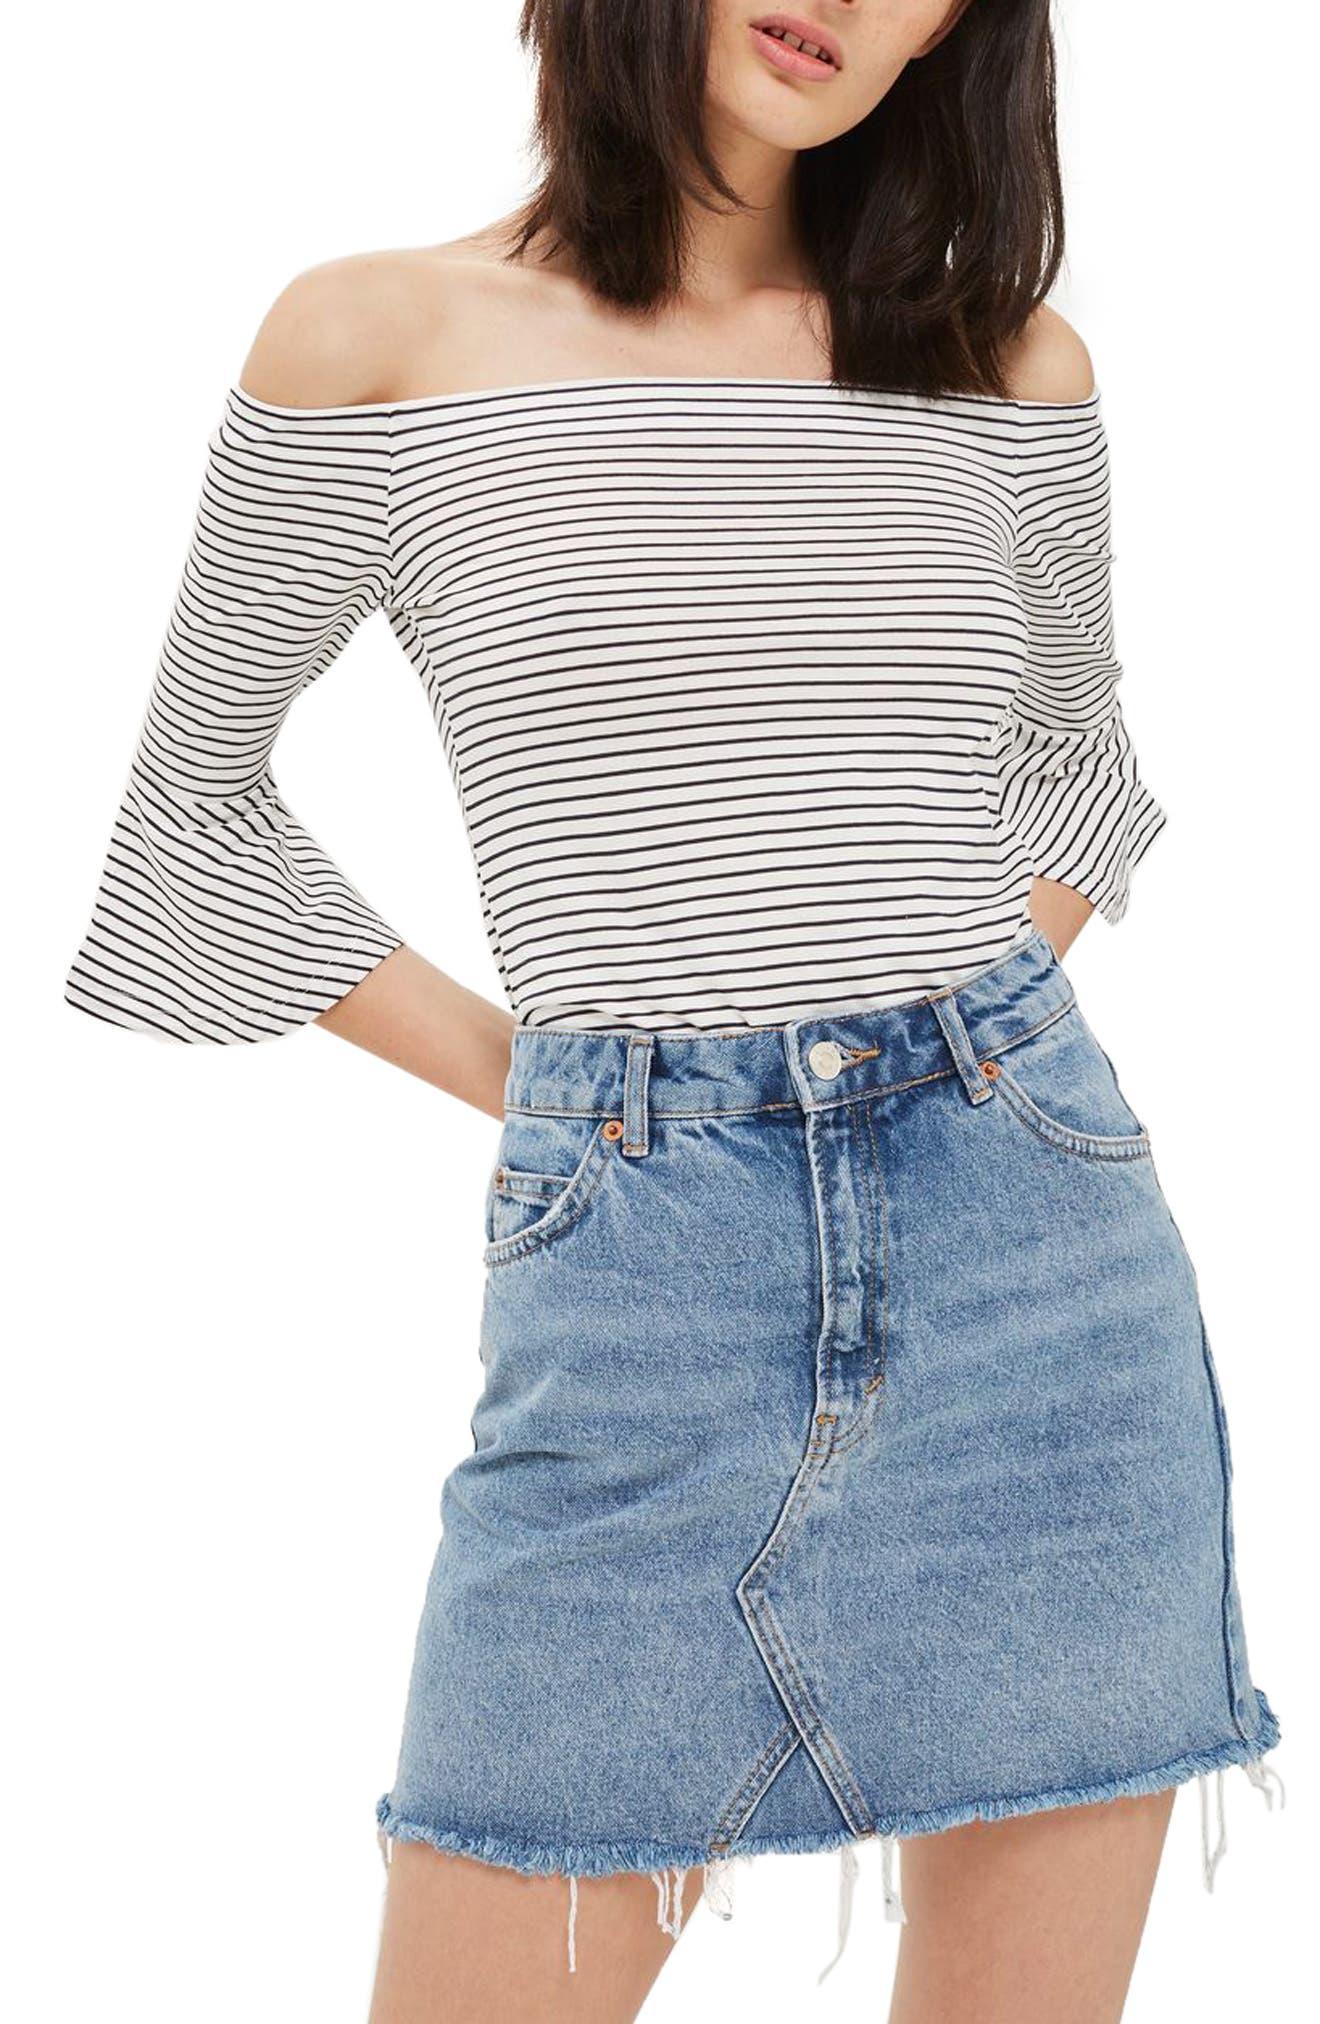 Topshop Stripe Off the Shoulder Bell Sleeve Top (Petite)